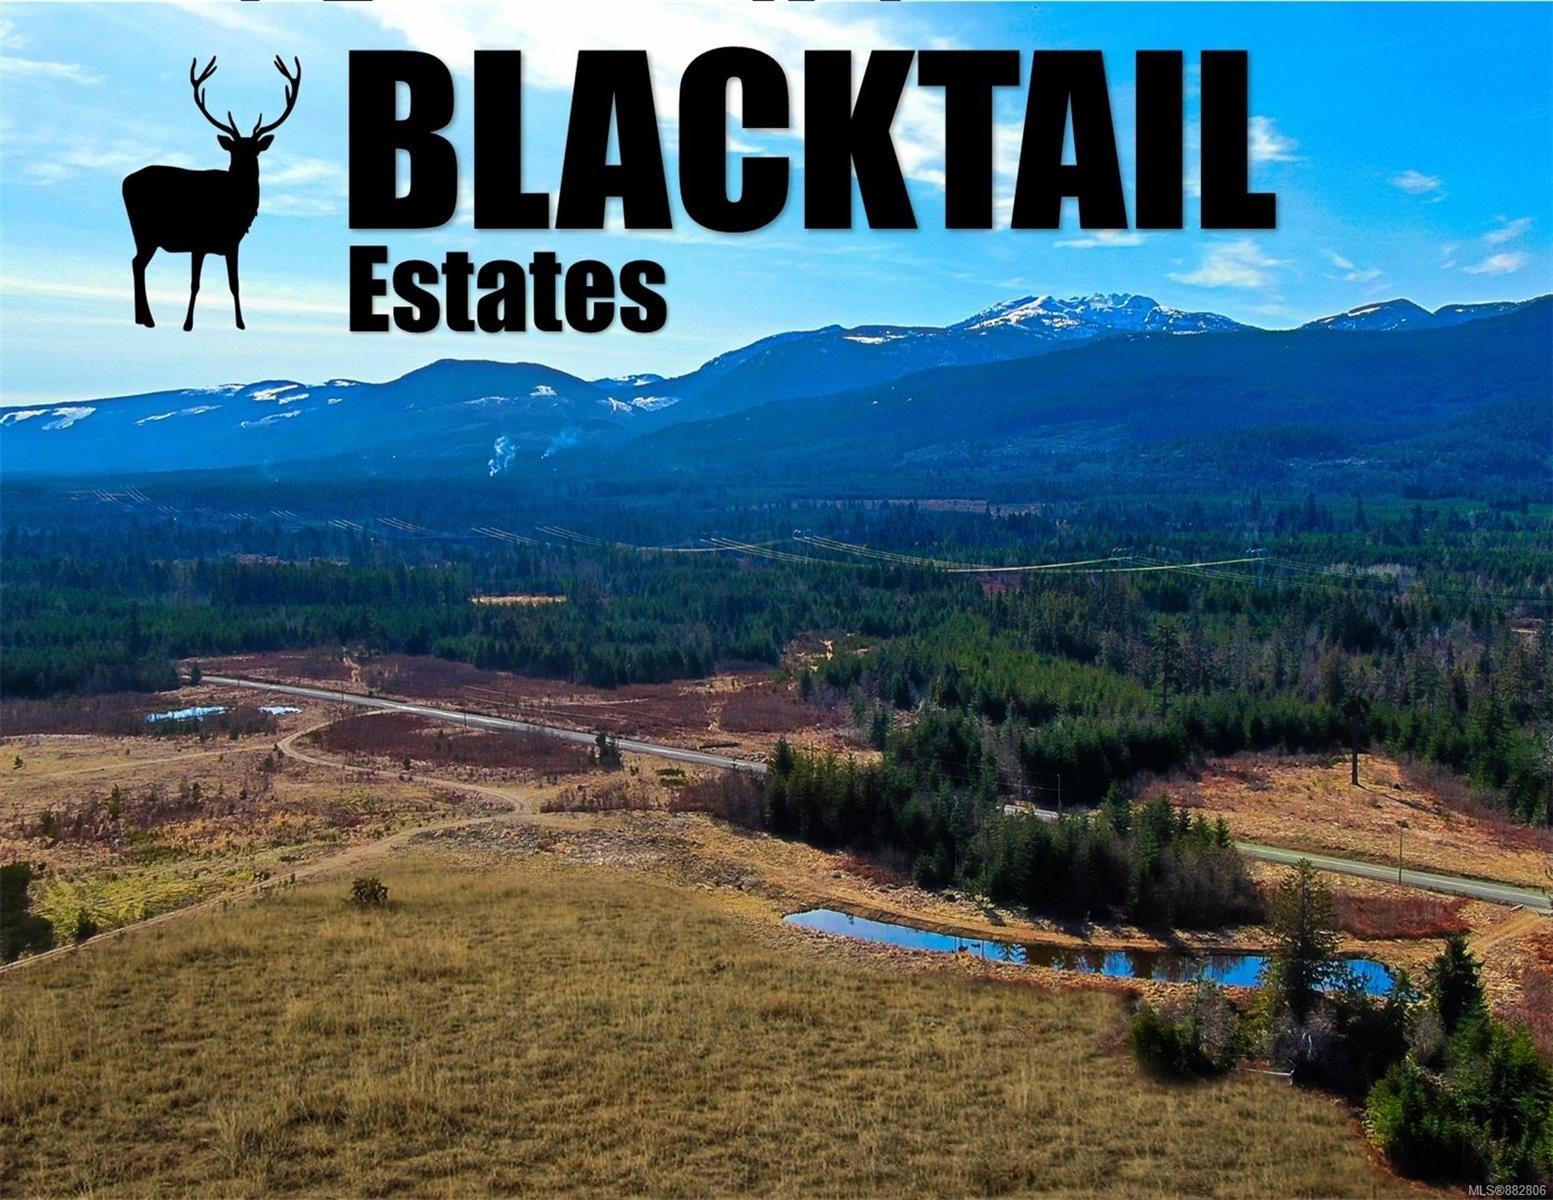 Main Photo: Lot 6 Blacktail Rd in : PQ Qualicum North Land for sale (Parksville/Qualicum)  : MLS®# 882806